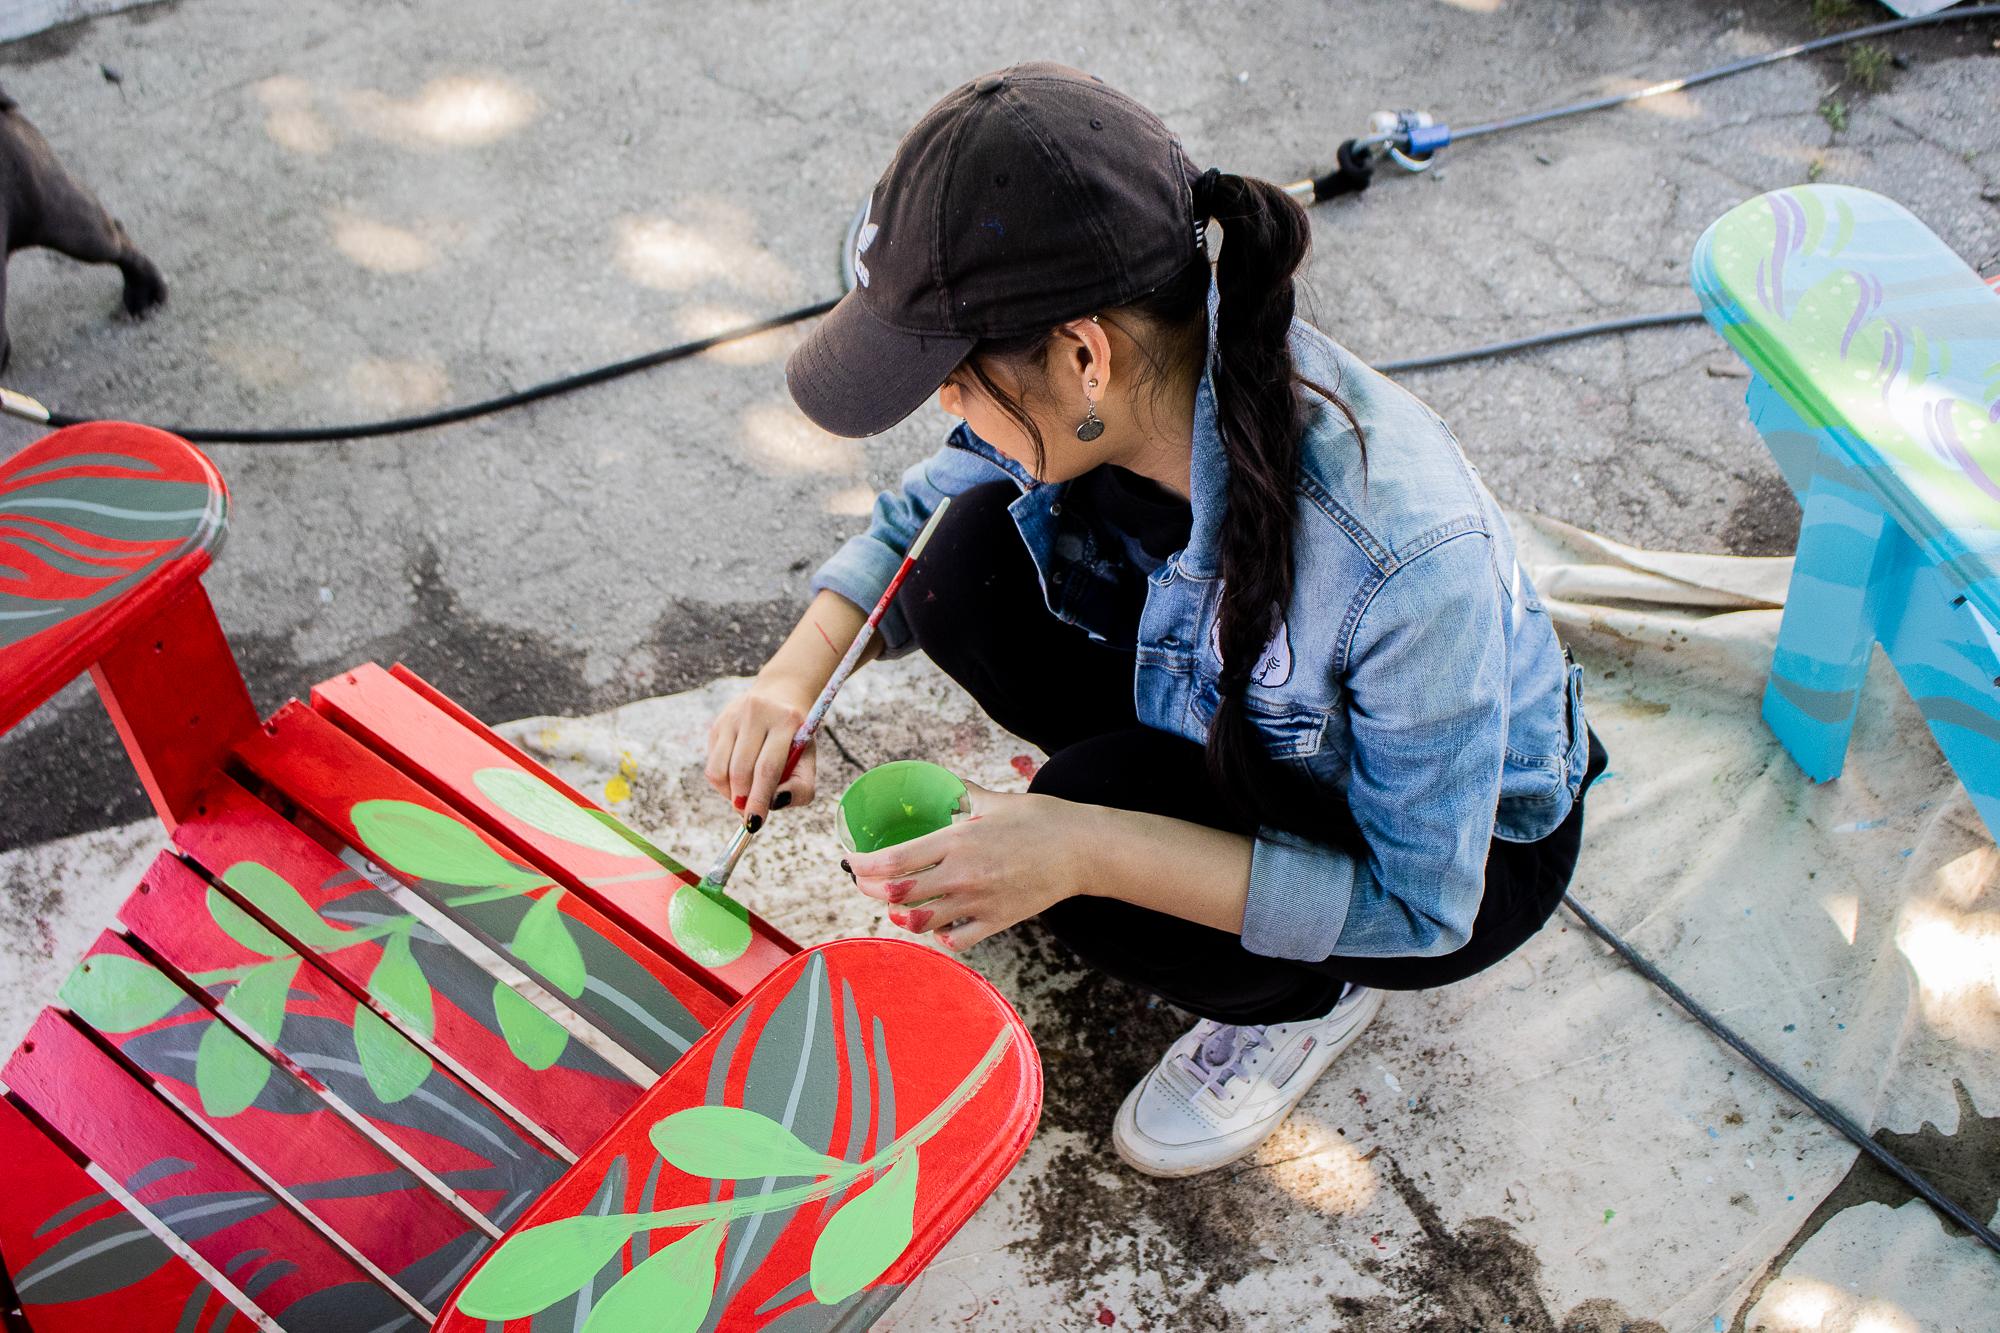 Katrina Canedo painting a red muskoka chair with green plants